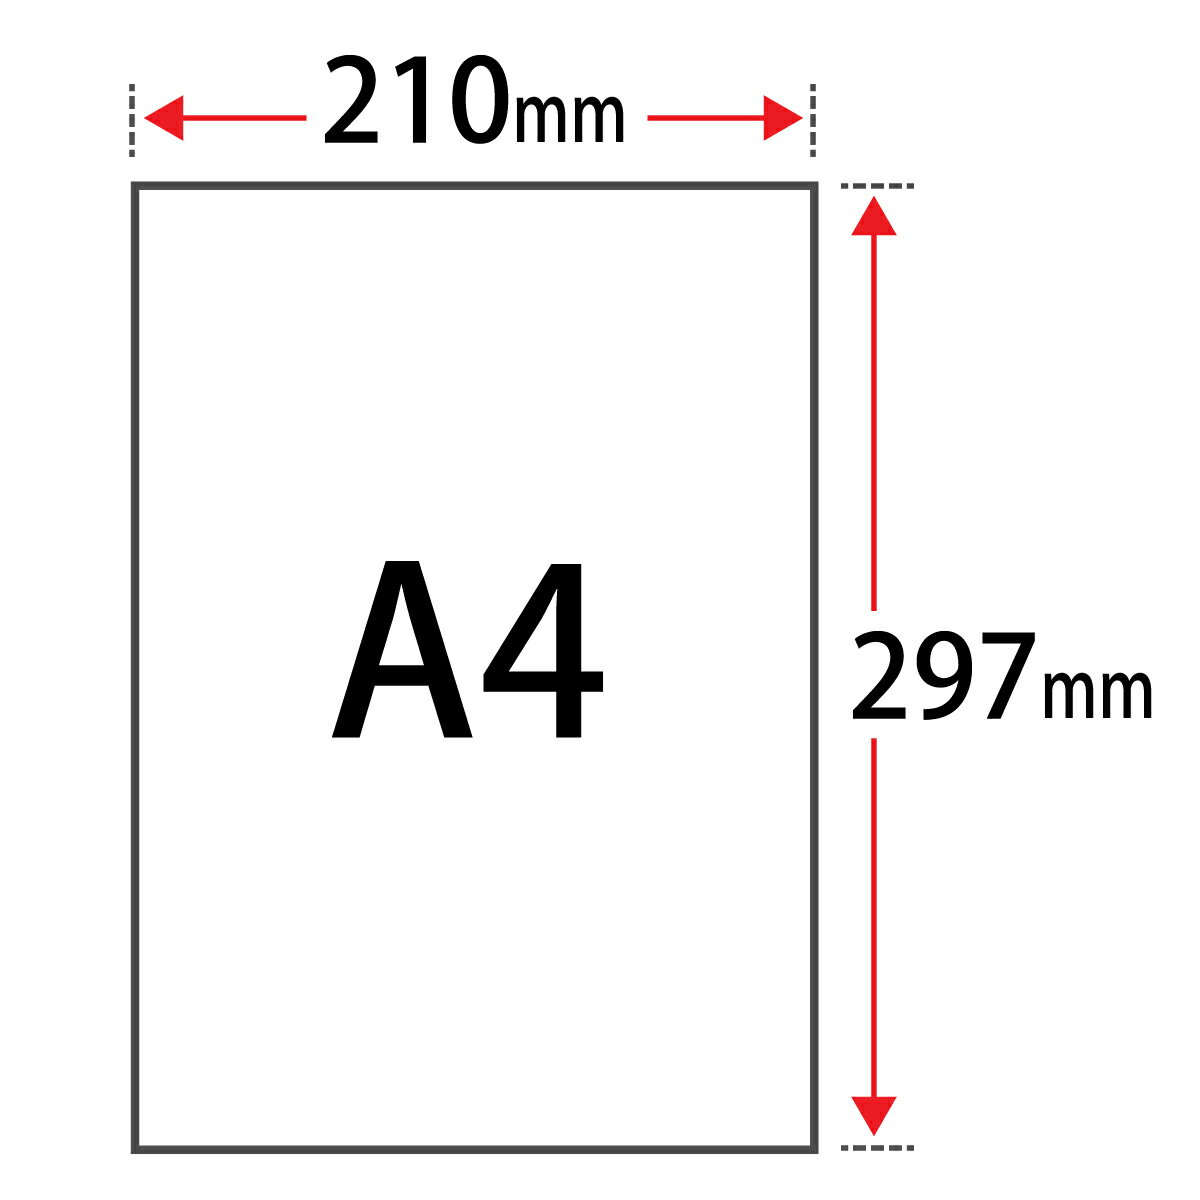 Mondi社 カラーコピー 200g/平米 A4サイズ:1250枚